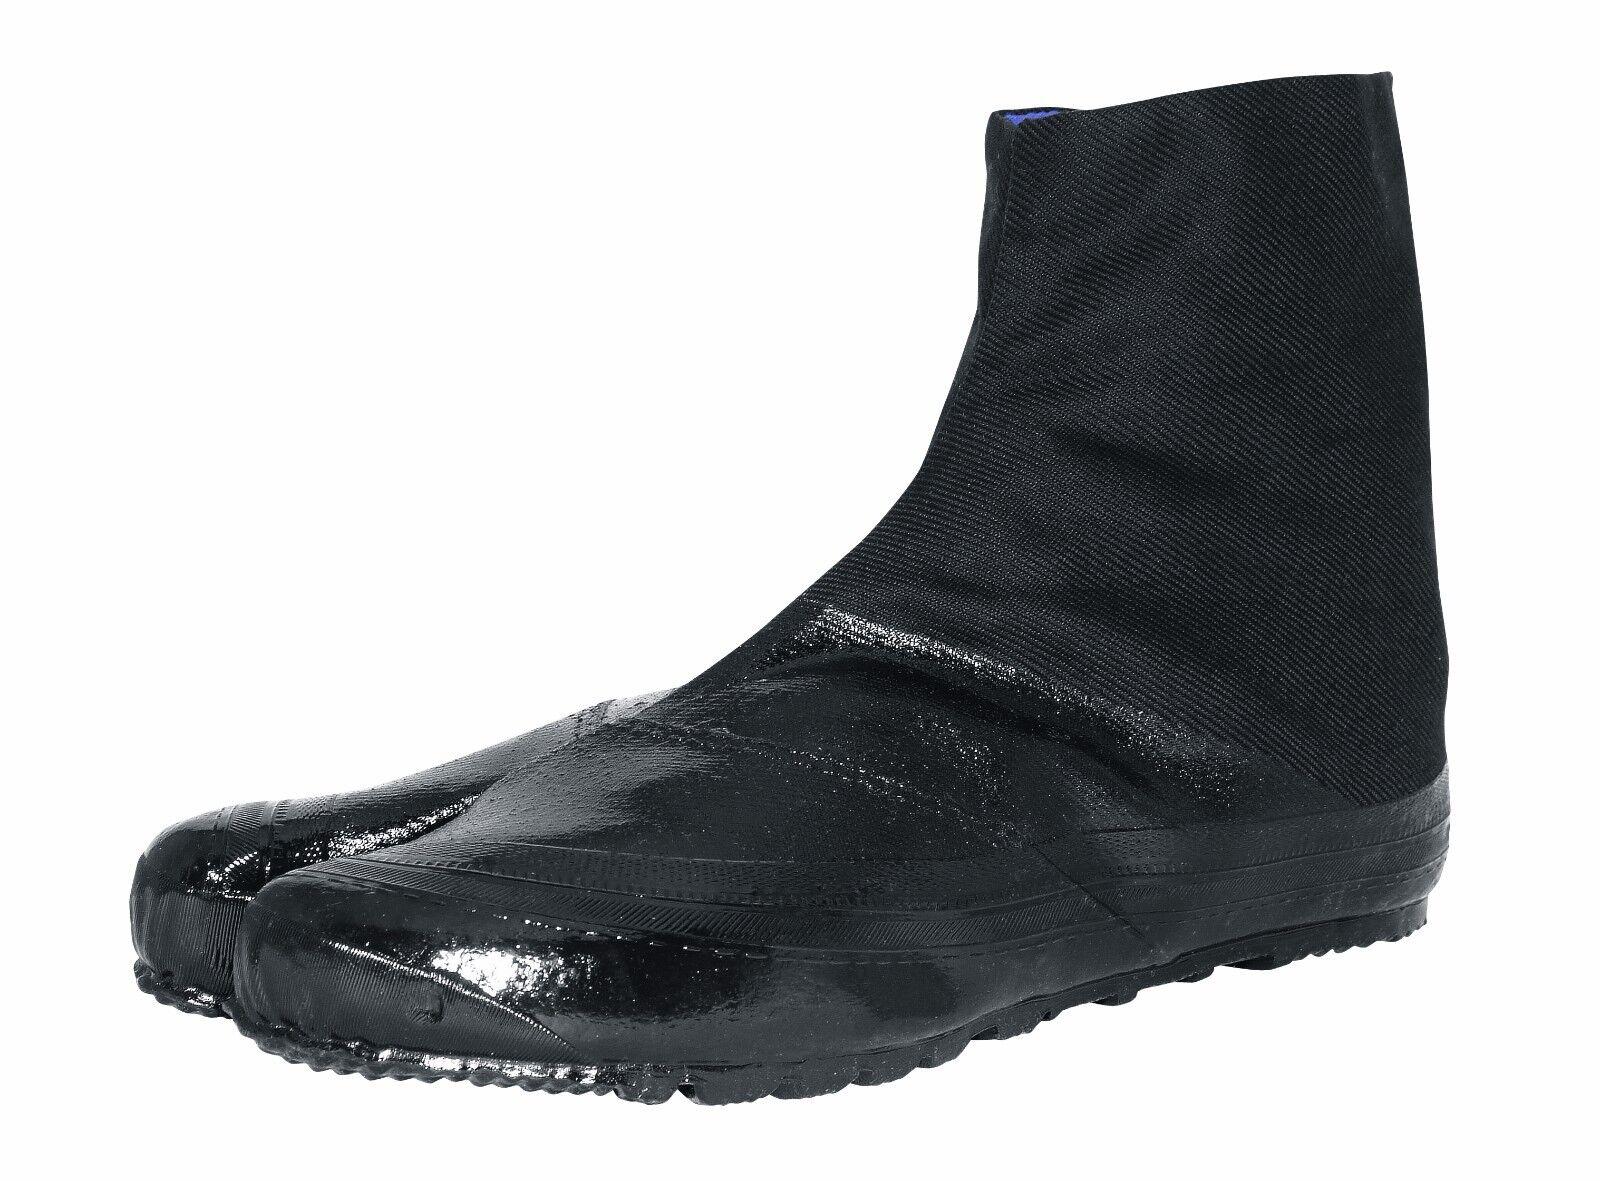 All Black Marugo Jitsuyo Ninja Tabi Boots Rubber Sole